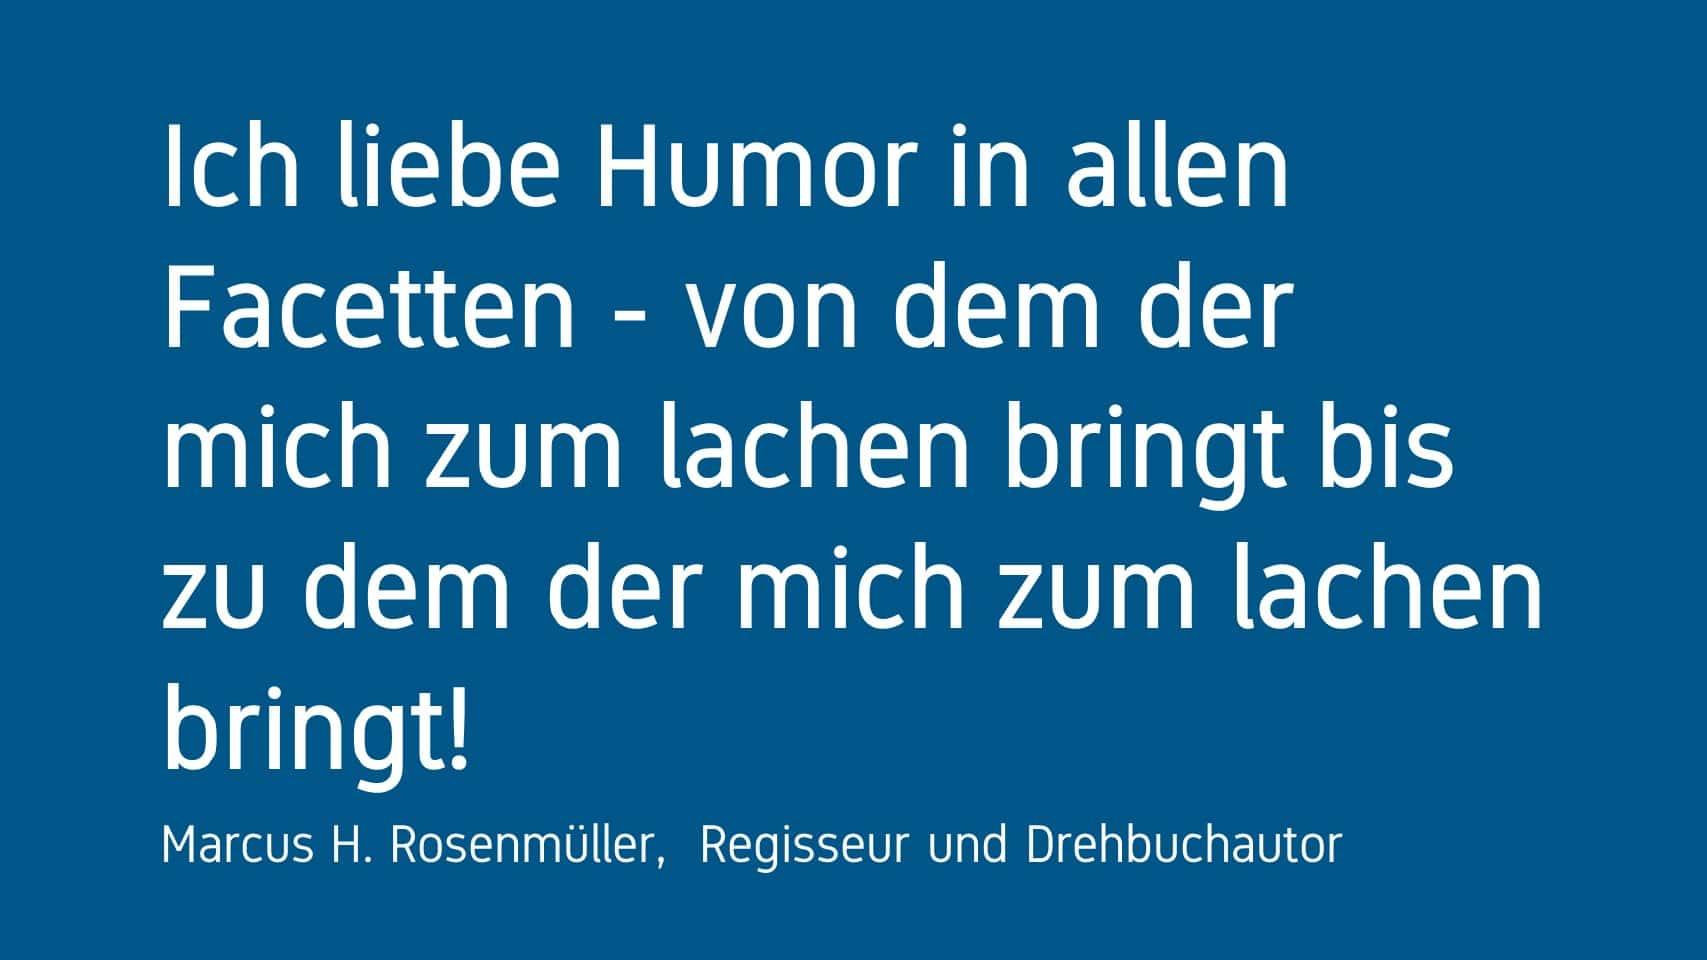 Marcus H. Rosenmüller Forum Humor